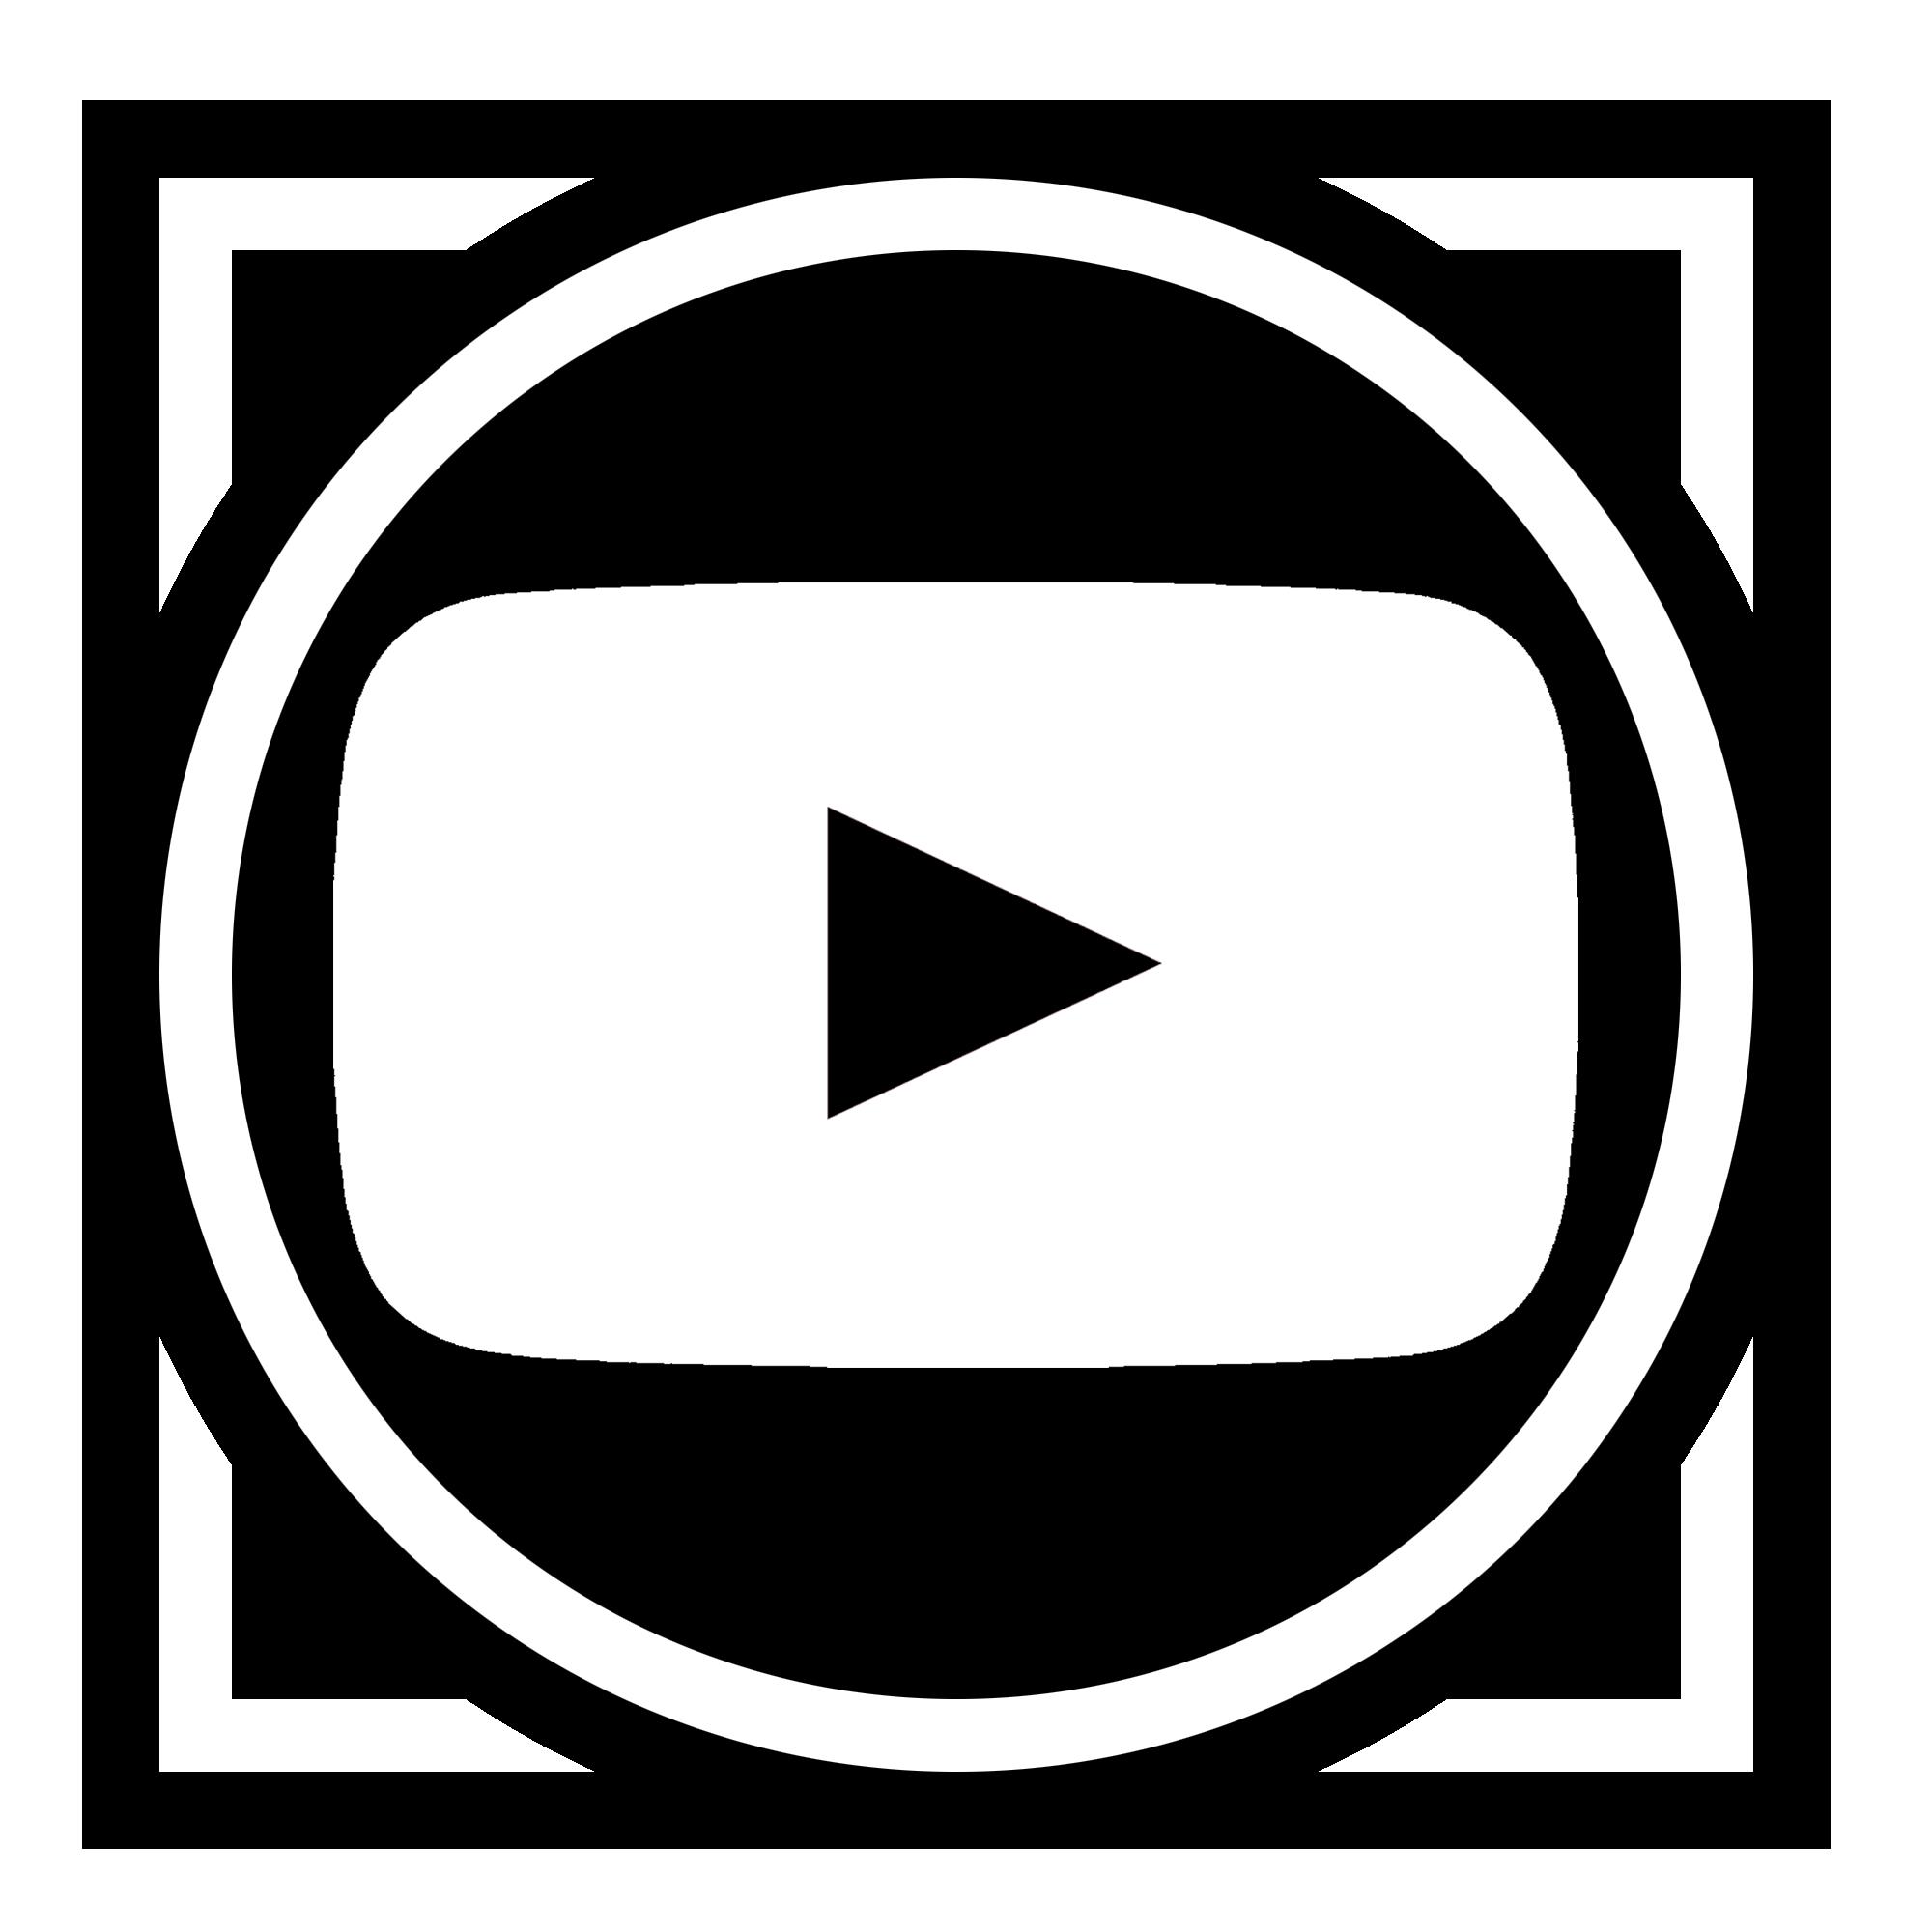 Logo For Science: Round Black Youtube Logo Icon Free Image